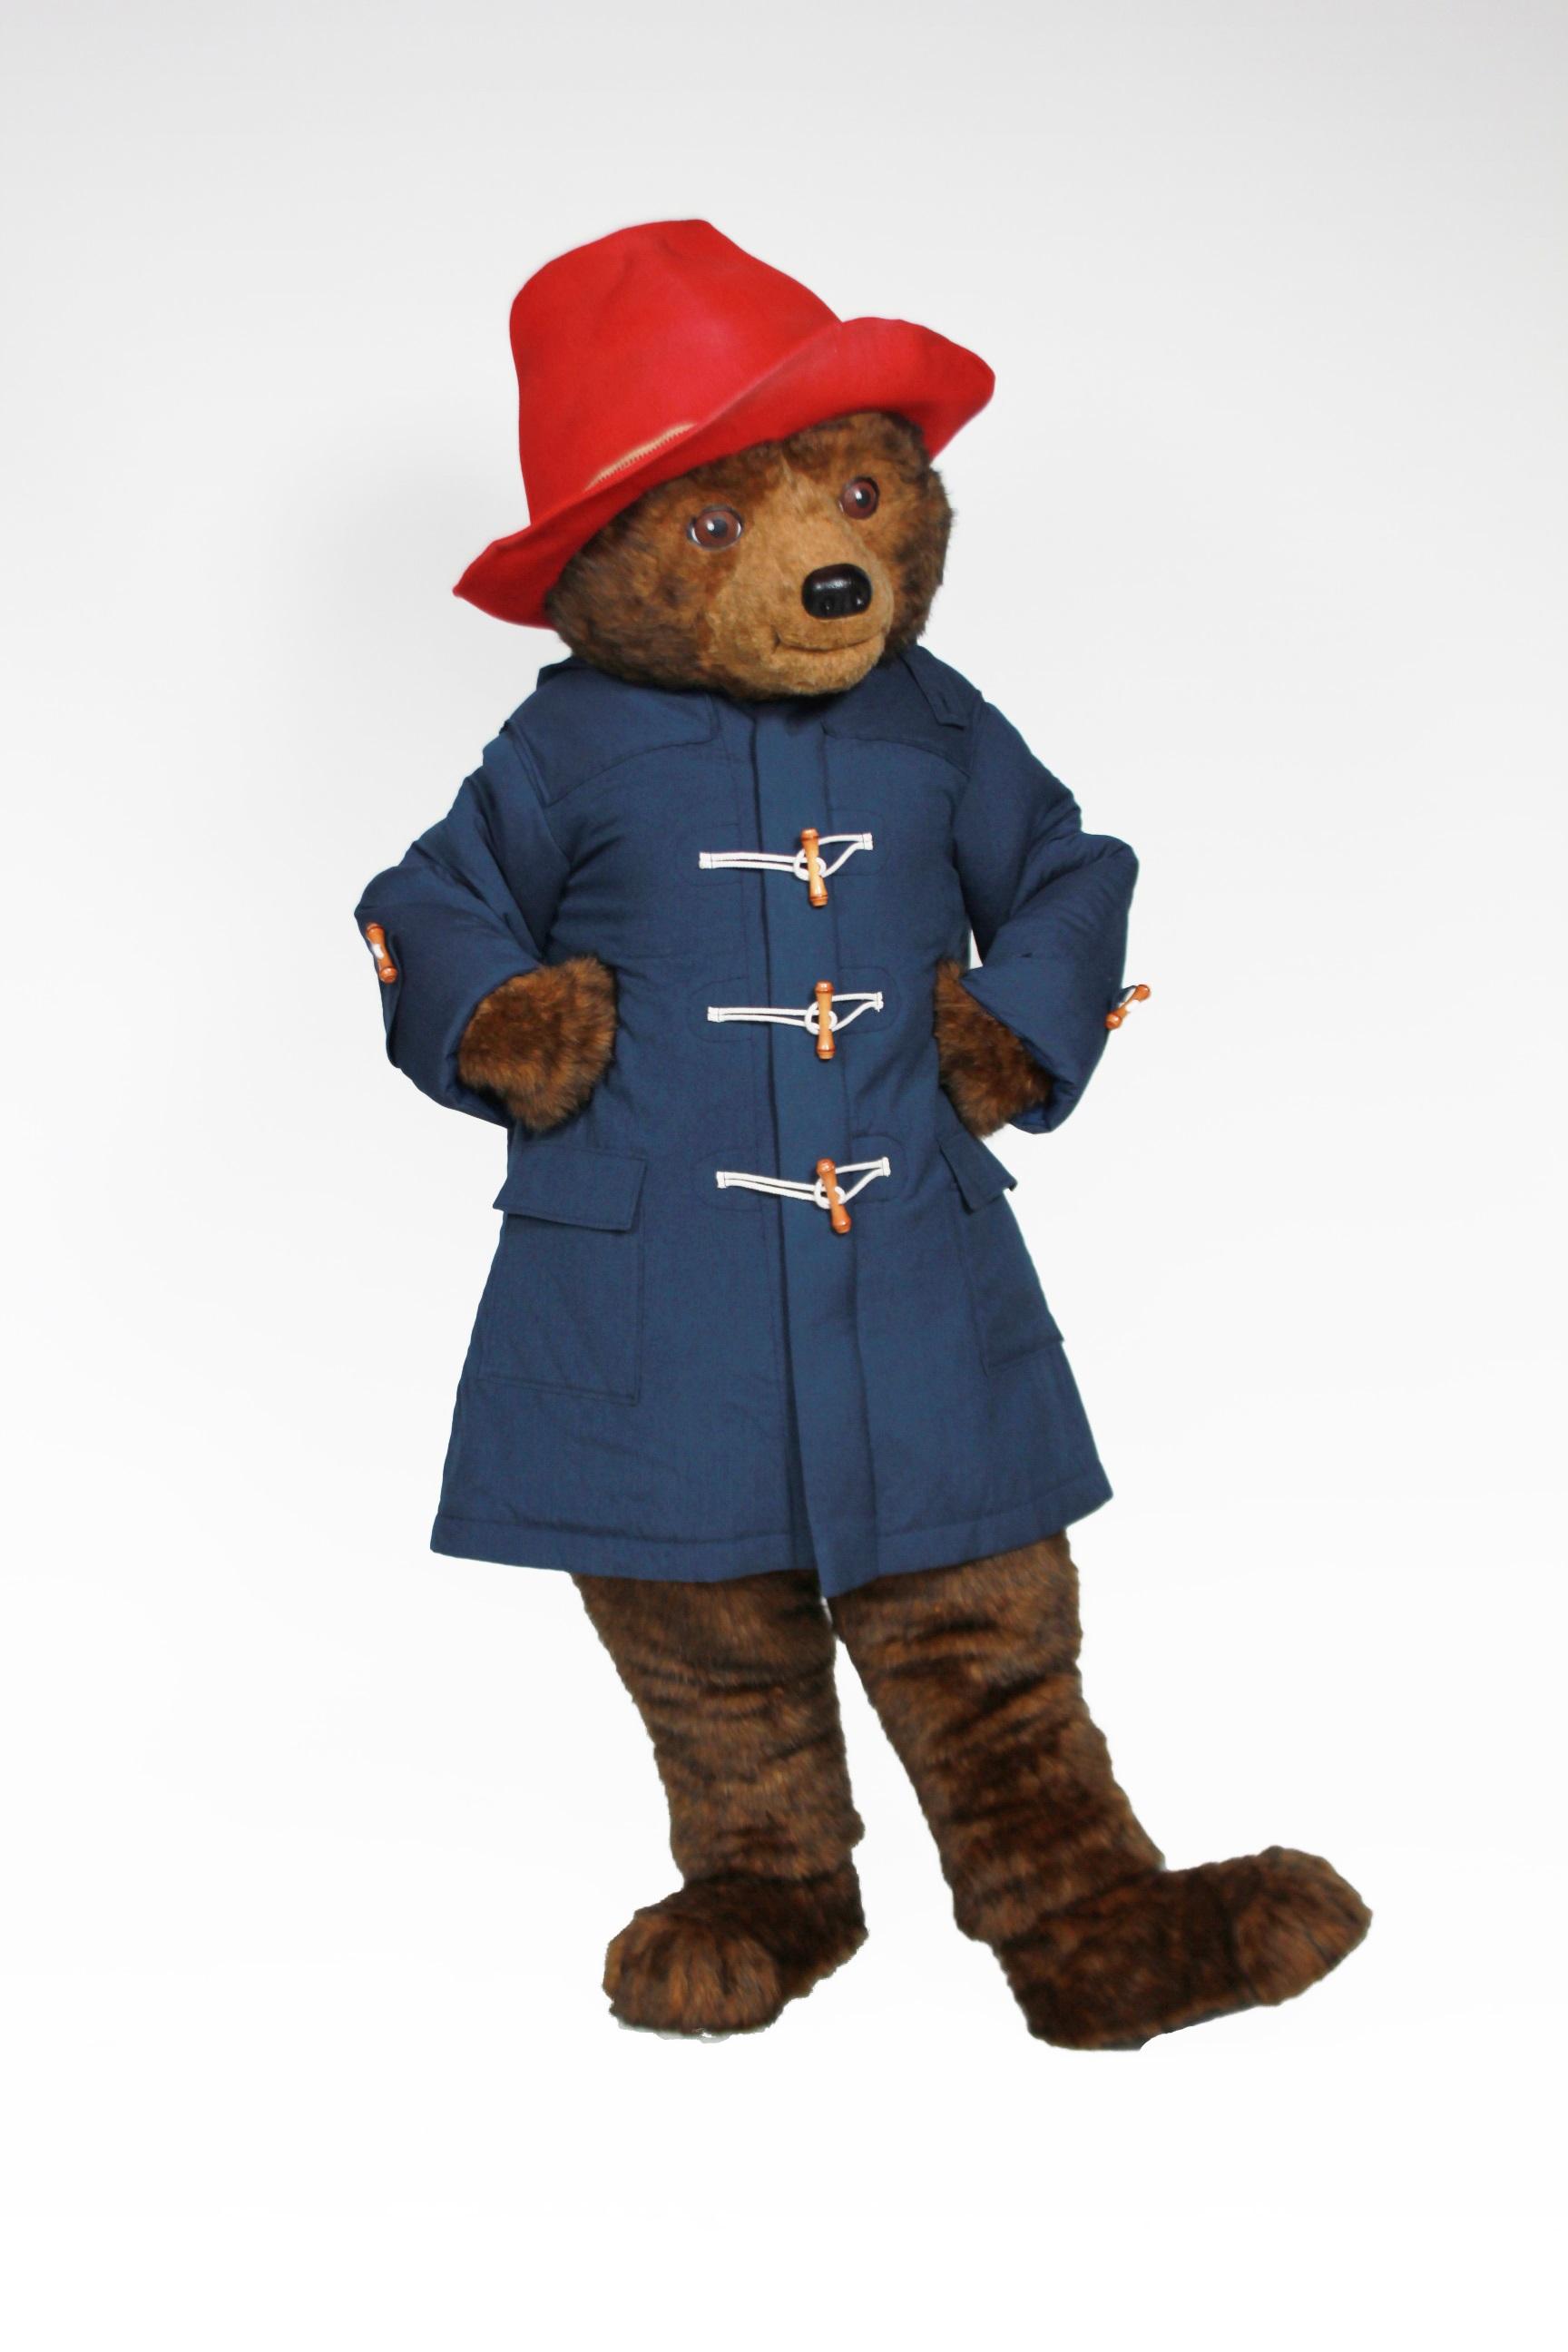 Paddington Bear wearing a blue coat and a red rain hat